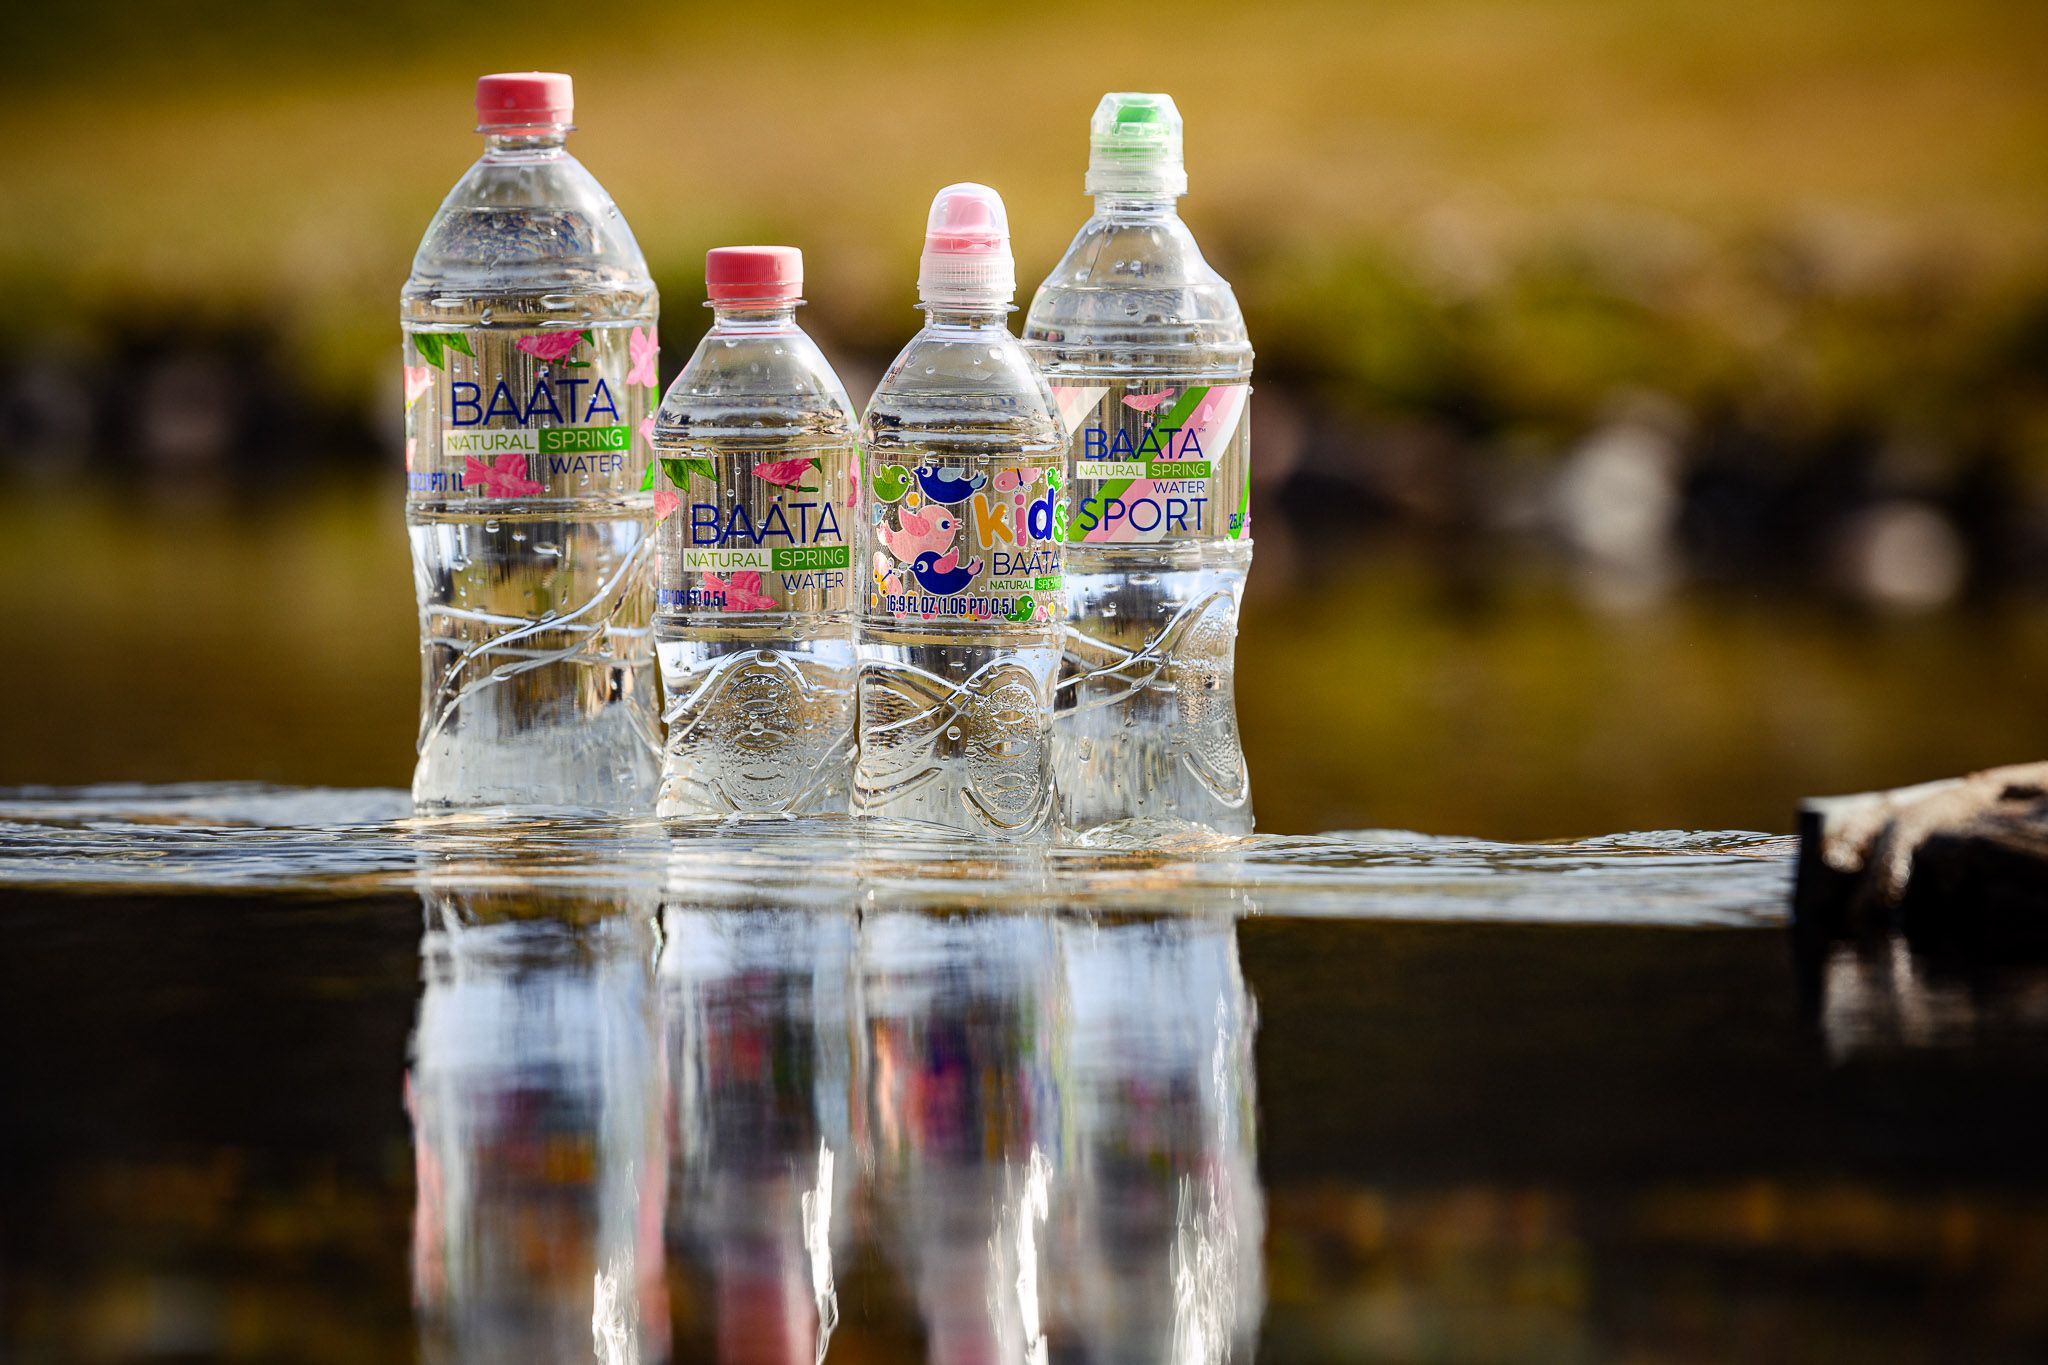 Natural spring water in 2020 natural spring water